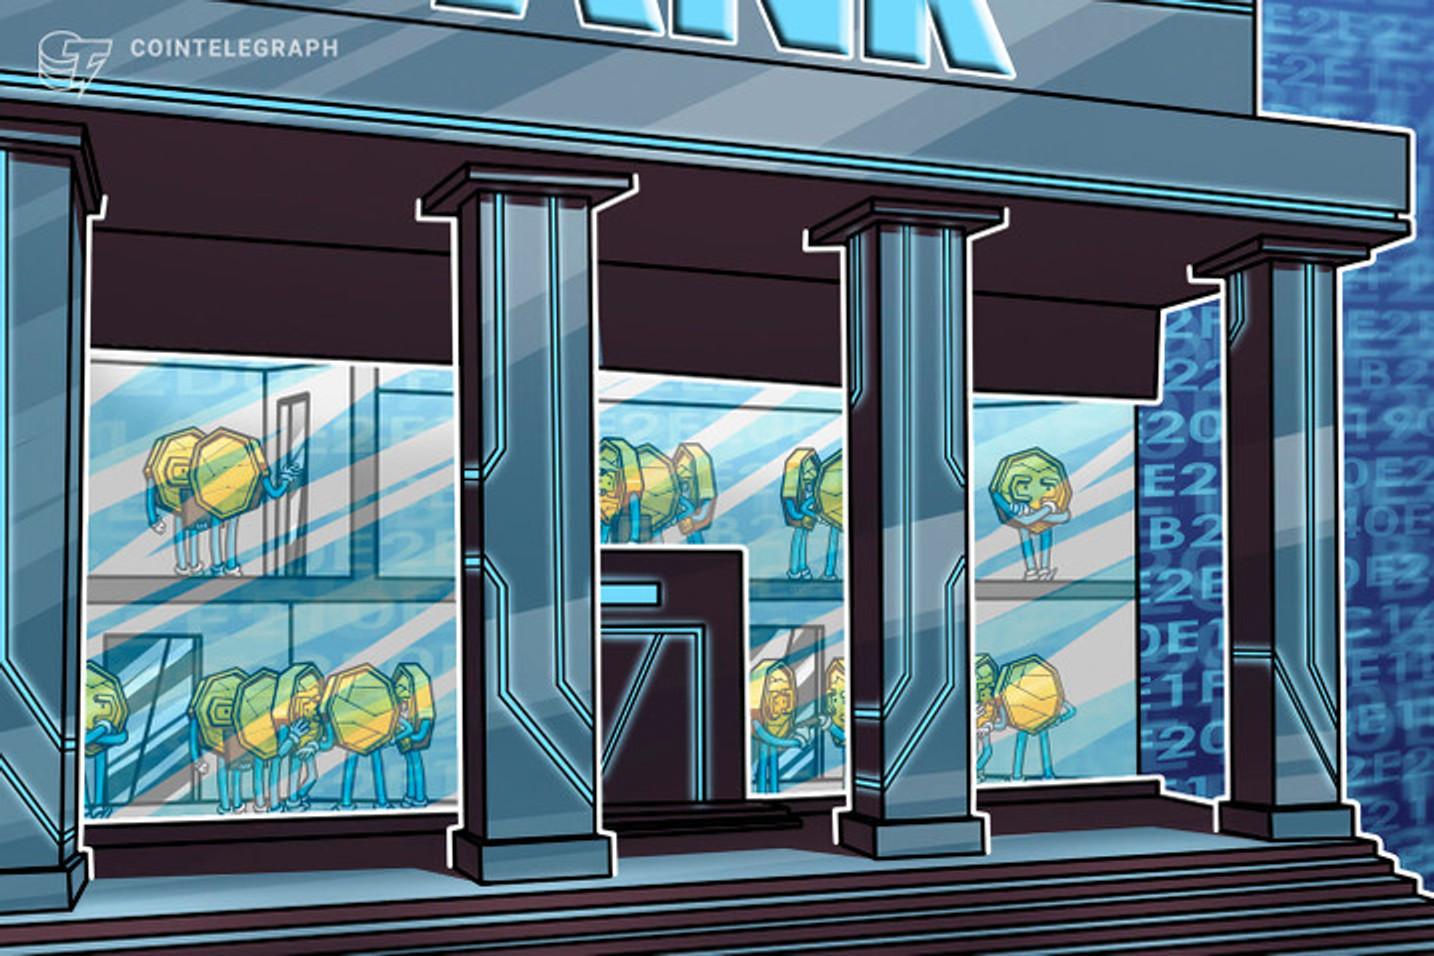 Banco Central do Brasil perde oportunidade ao não usar Blockchain no Open Banking afirma especialista